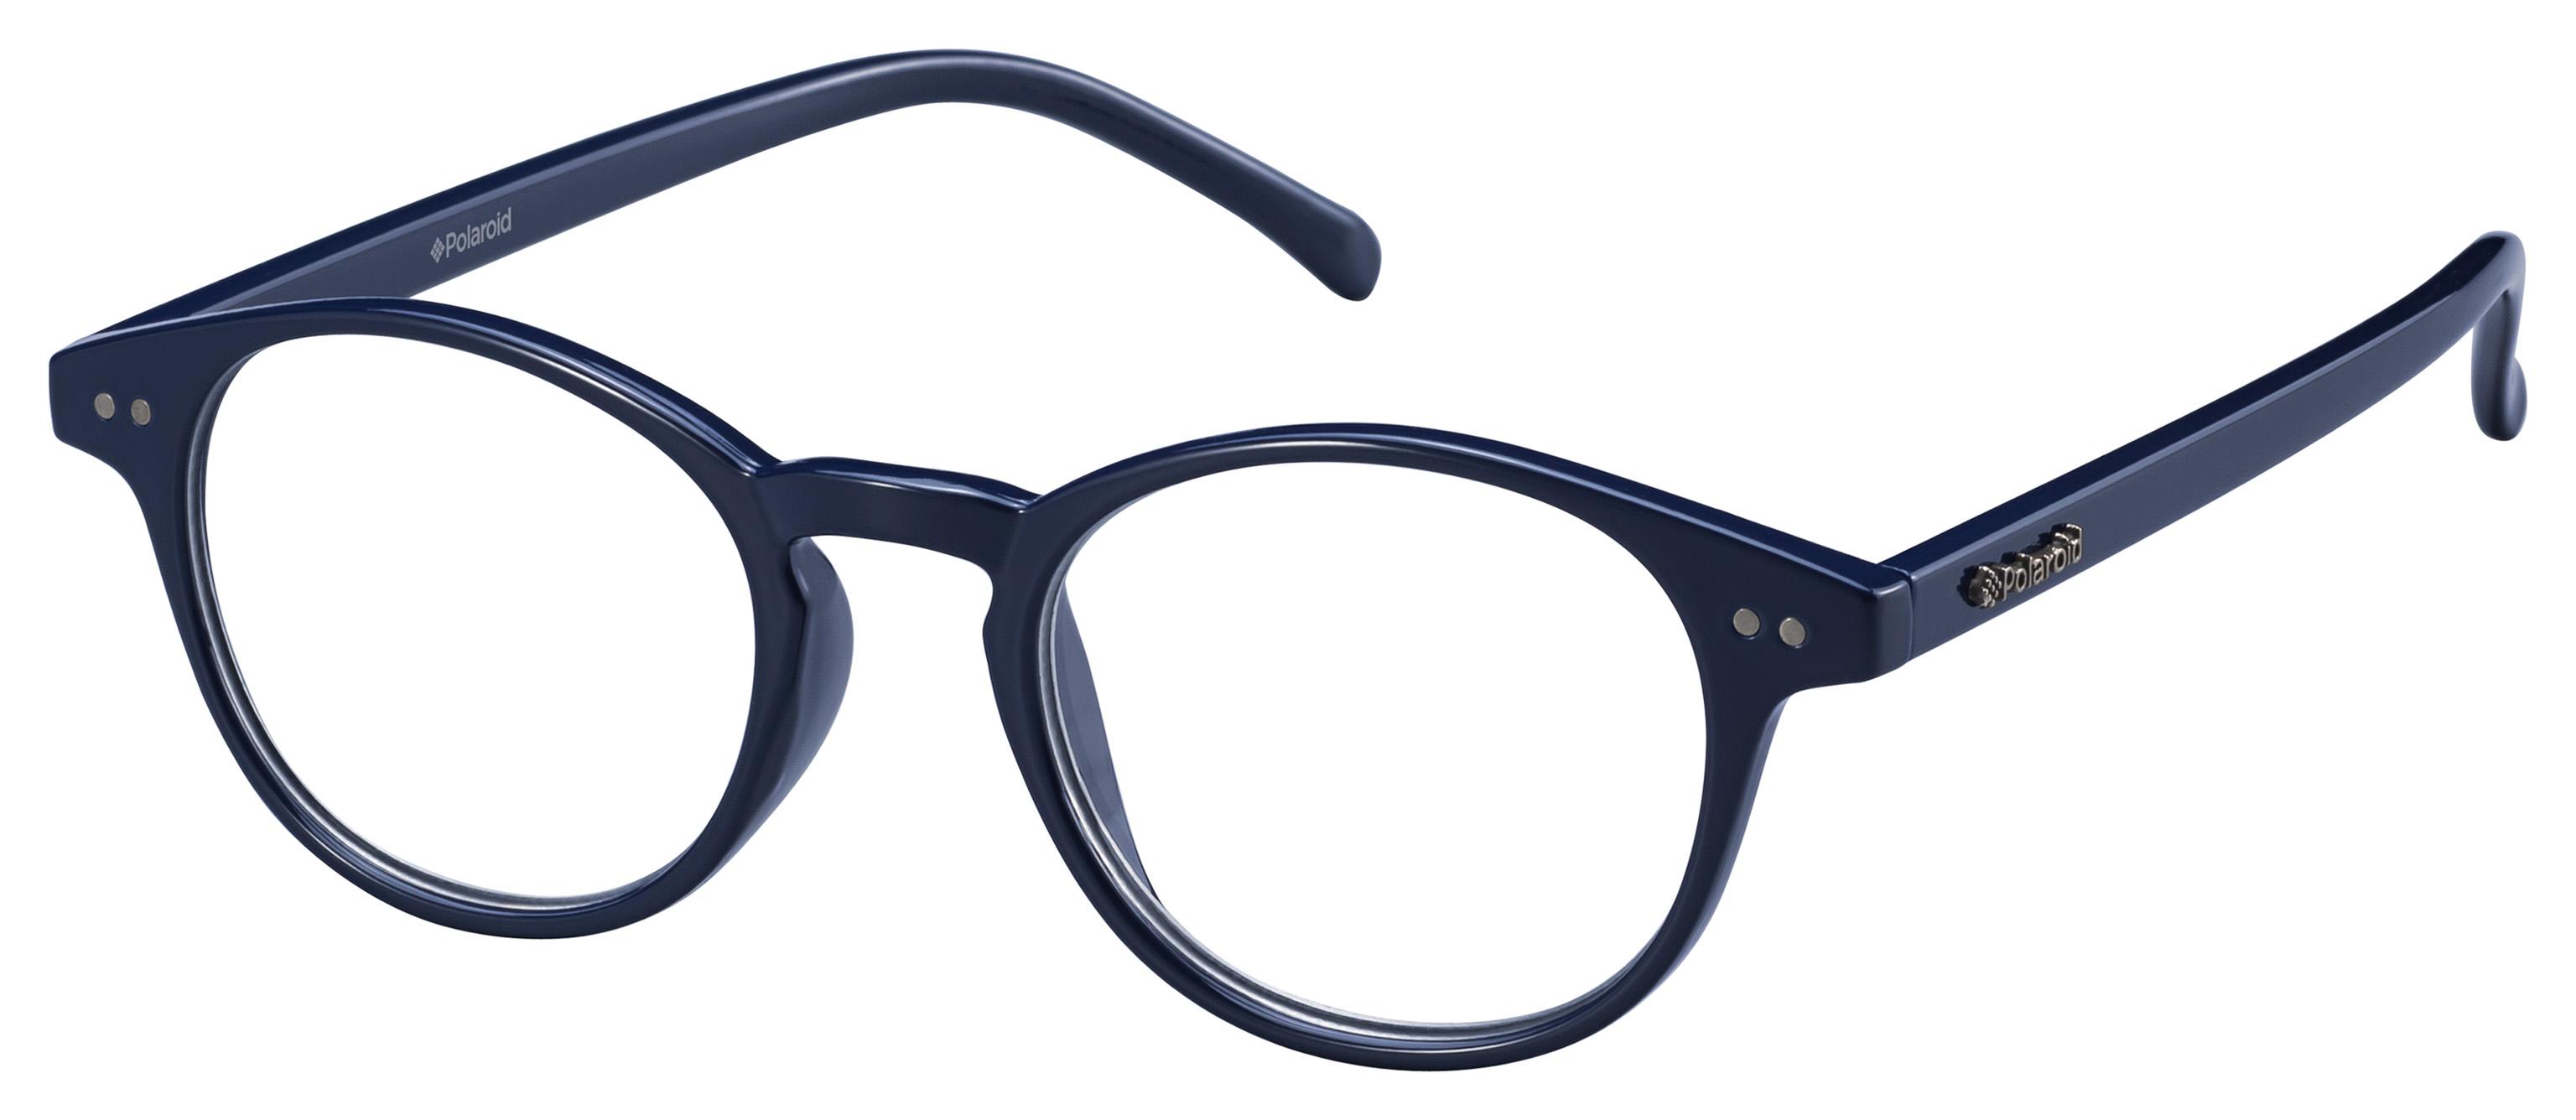 Leesbril Polaroid PLD0008 donkerblauw